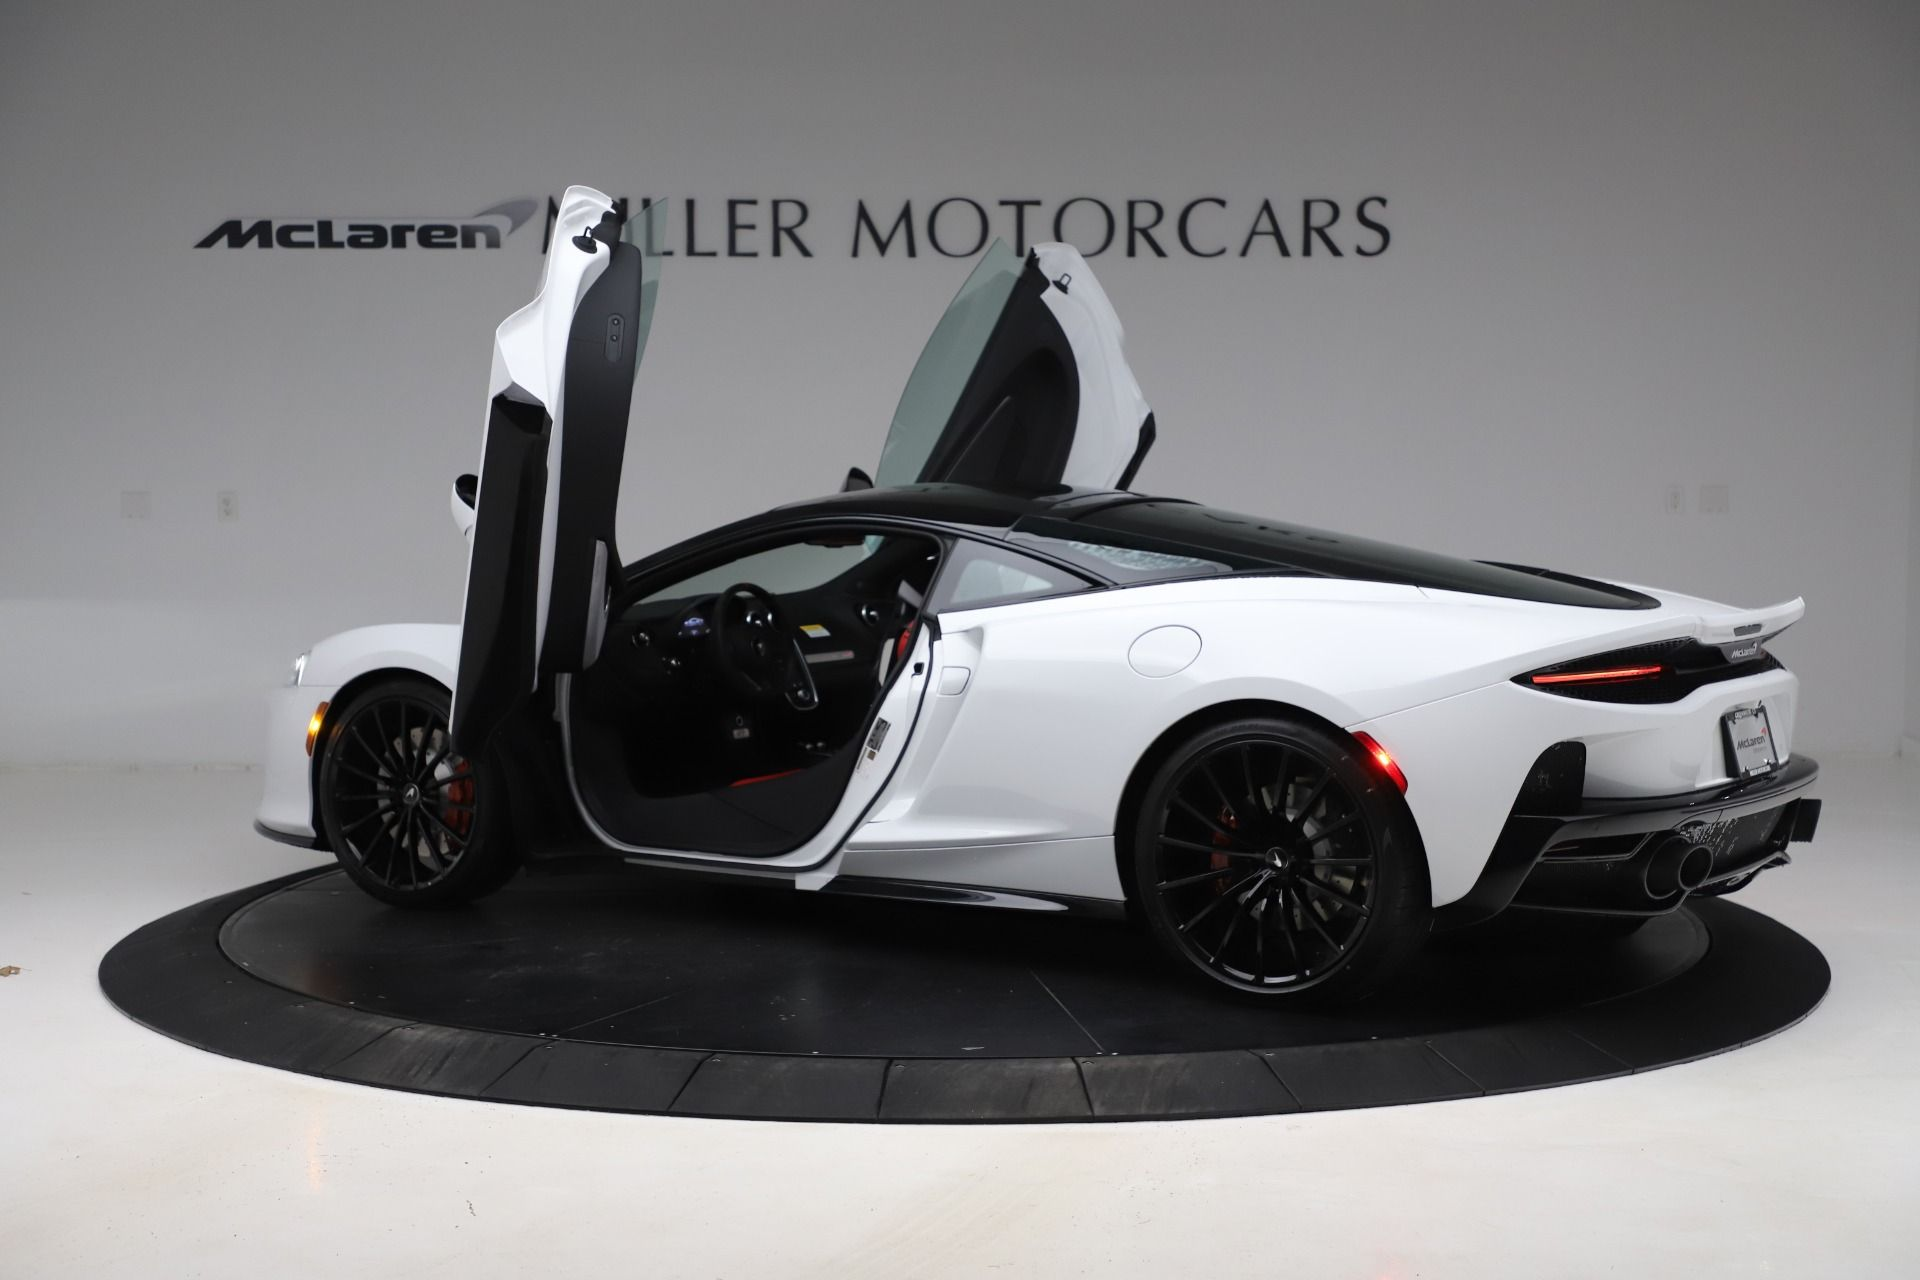 For sale 2020 McLaren GT Coupe Miller Motorcars